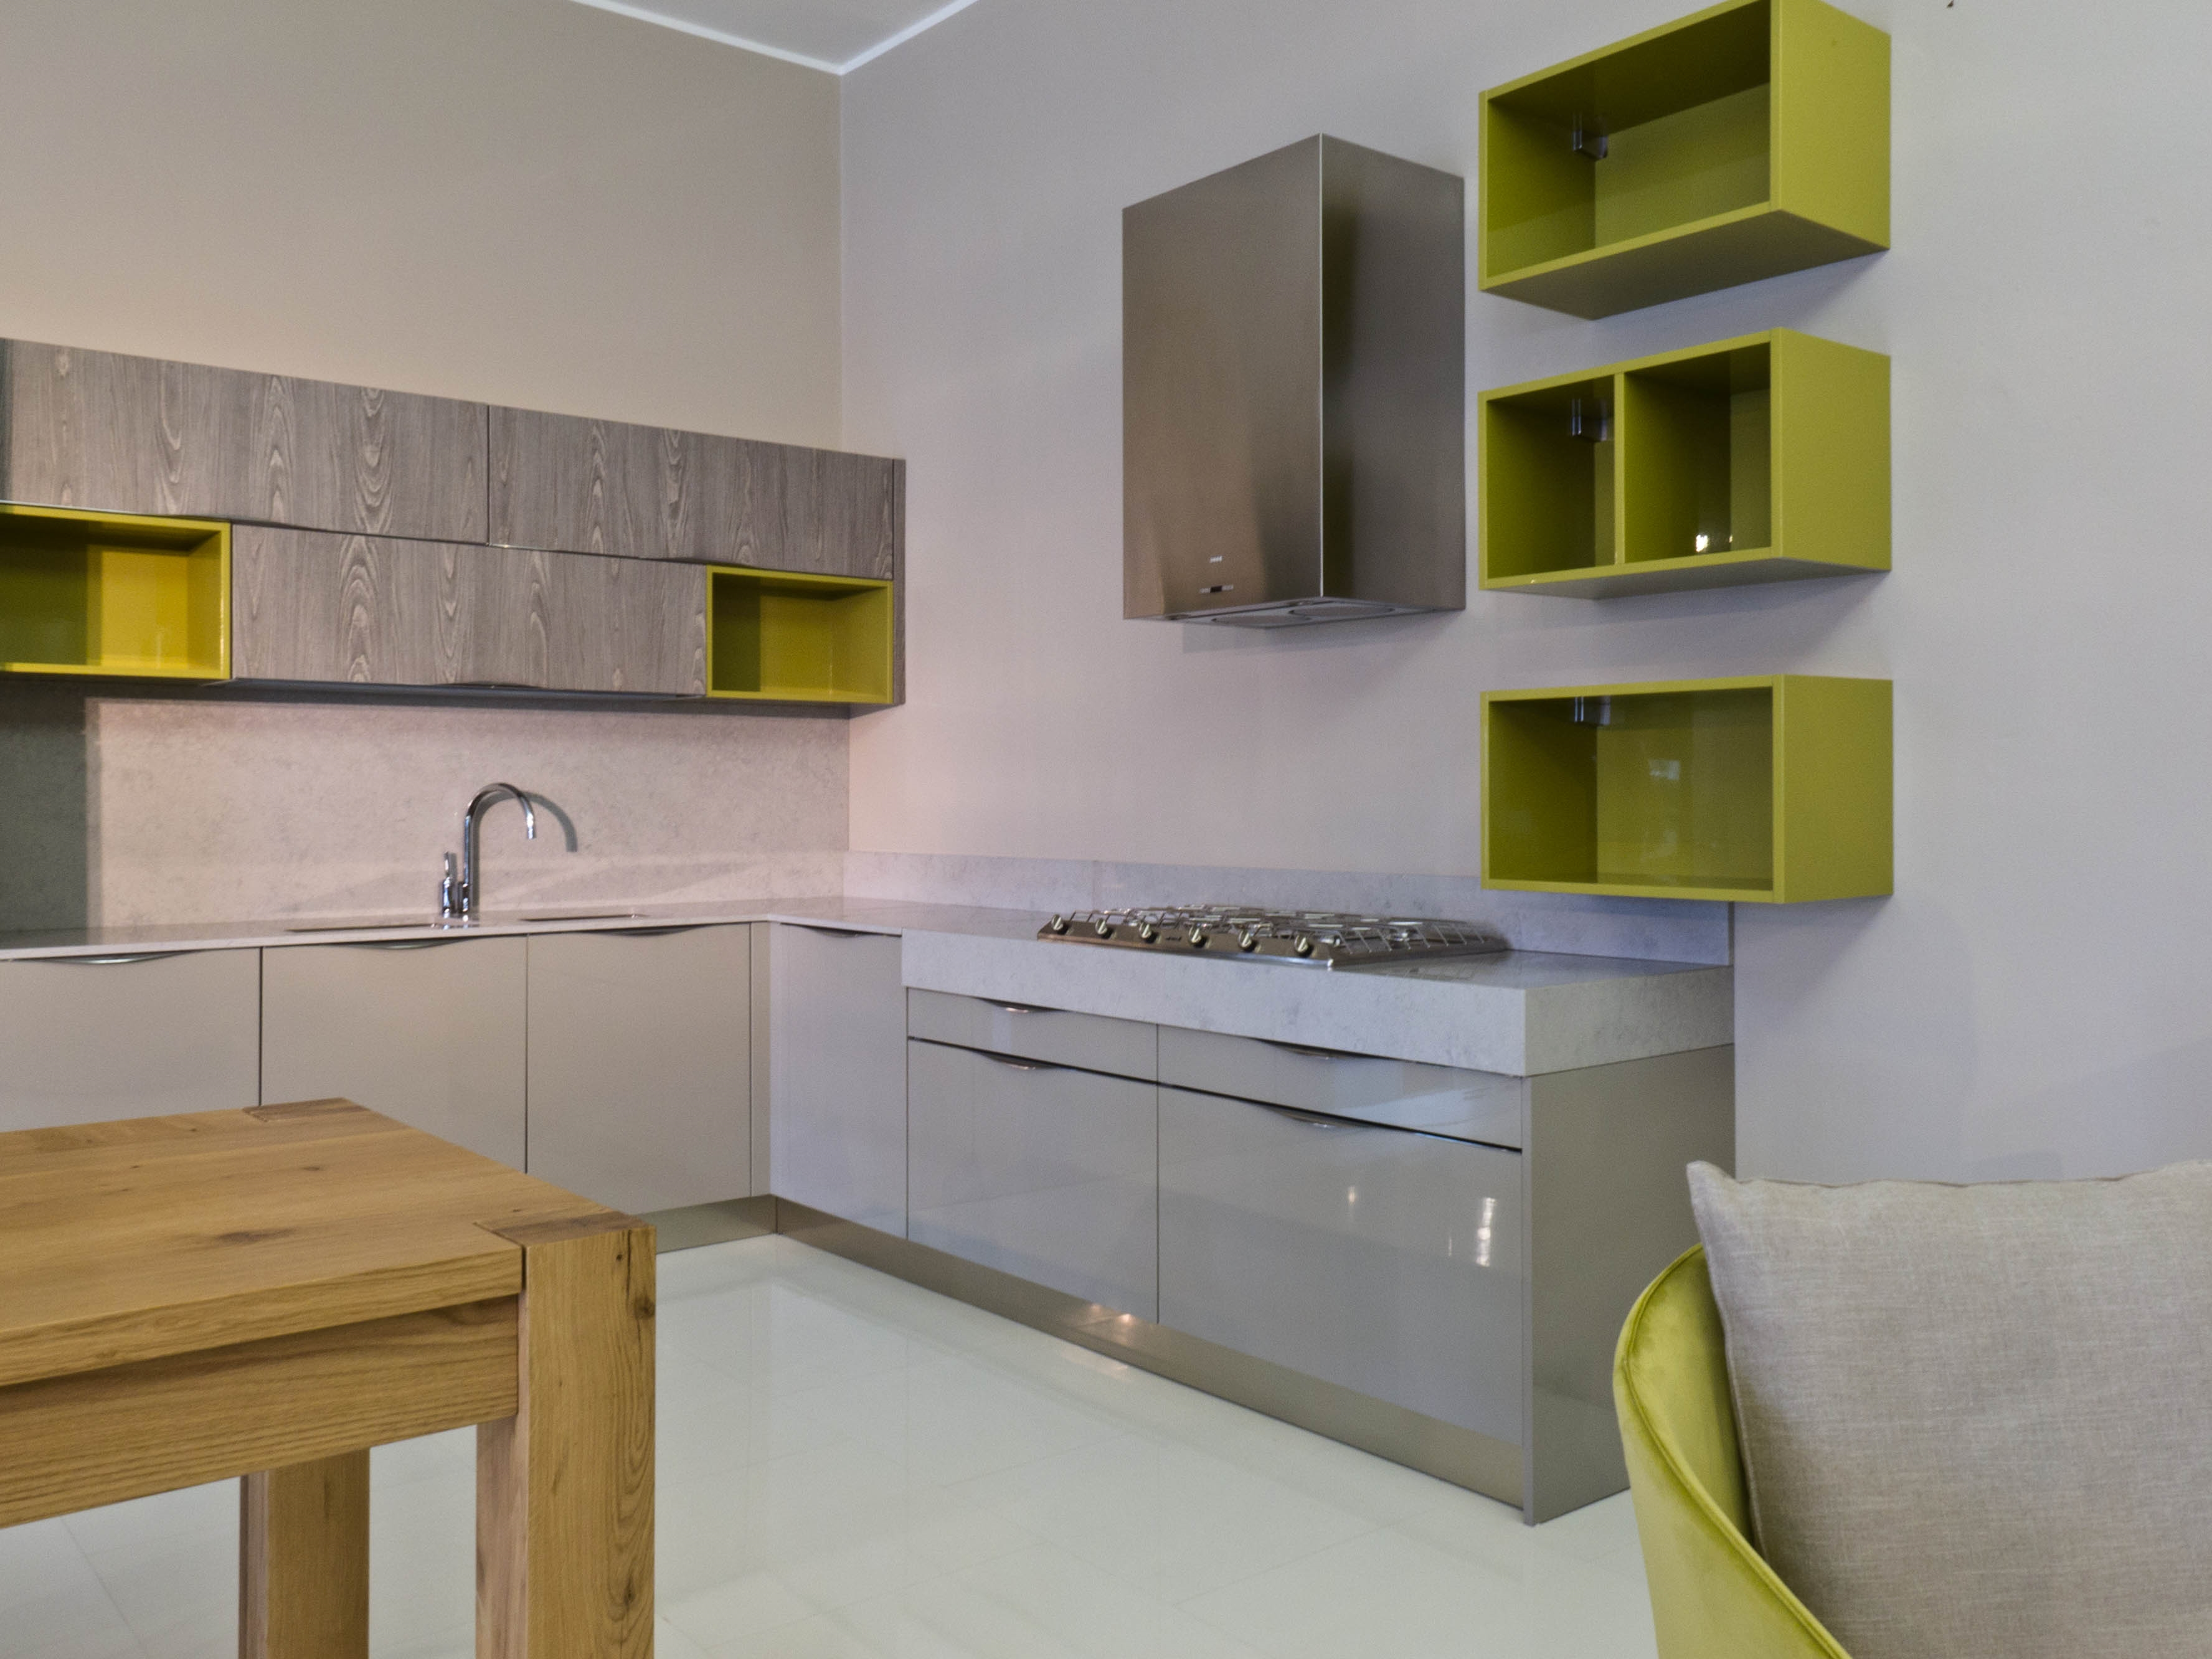 Affordable piastrelle per cucina bianca good moduli for Mattonelle finte per cucina